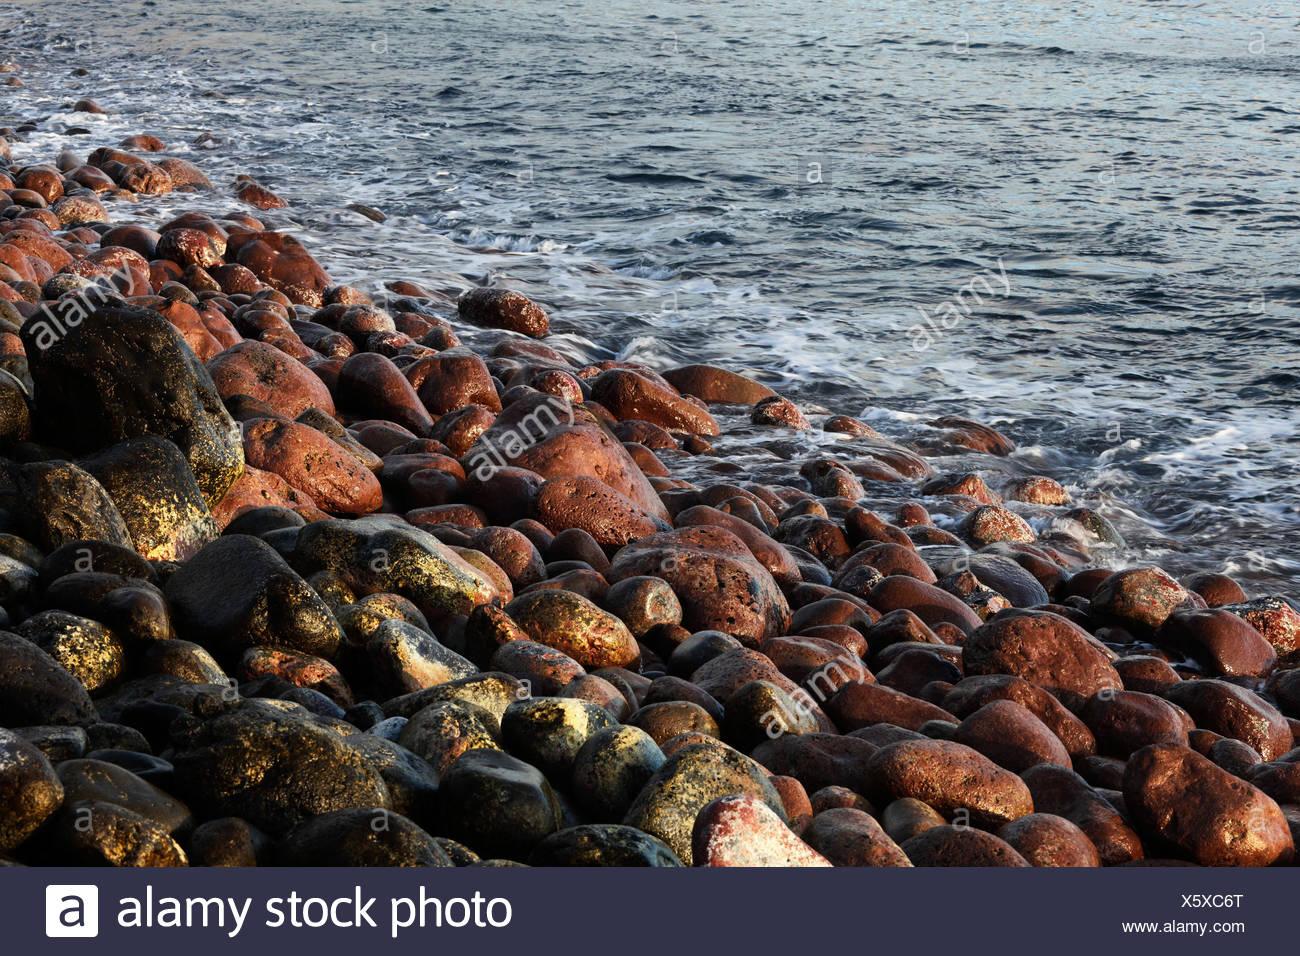 Red and black stones on a beach, Playa de Santiago, La Gomera, Canary Islands, Spain, Europe Stock Photo